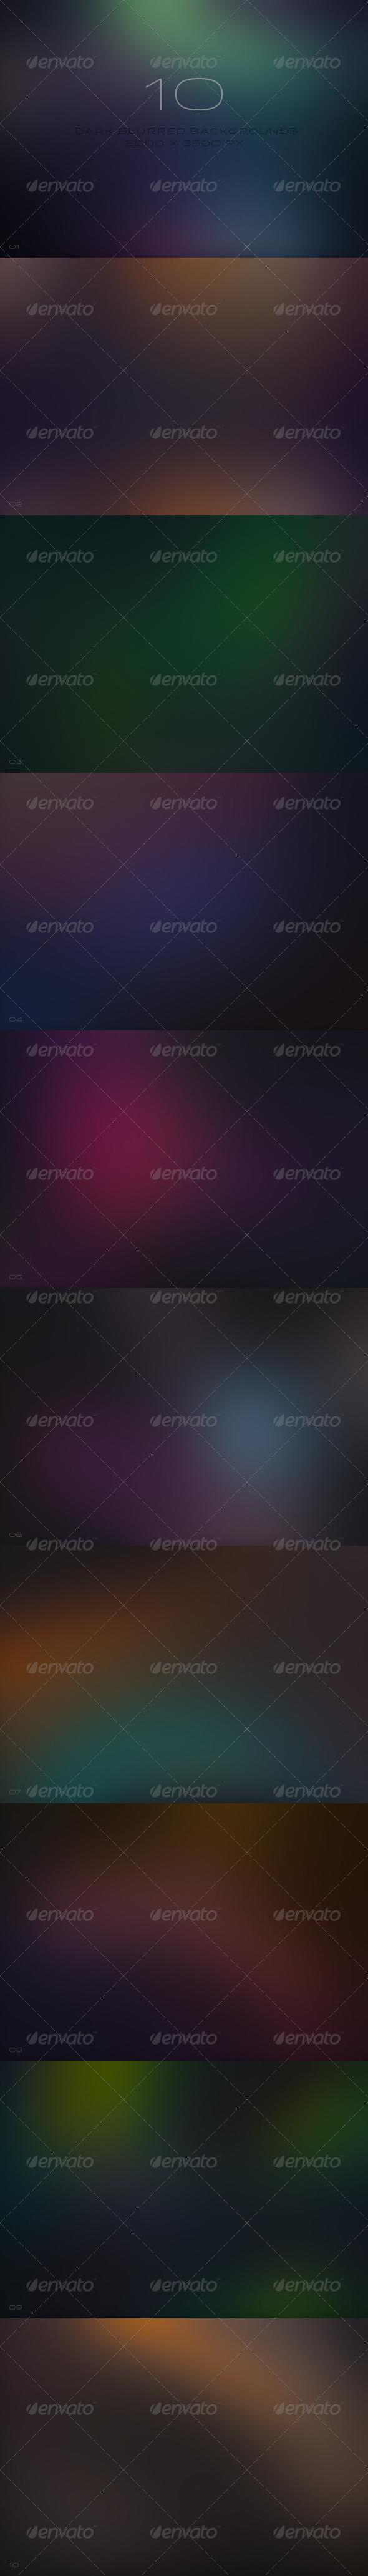 10 Dark Blurred Backgrounds 4k Ultra Hd Blurred Background Background Blur